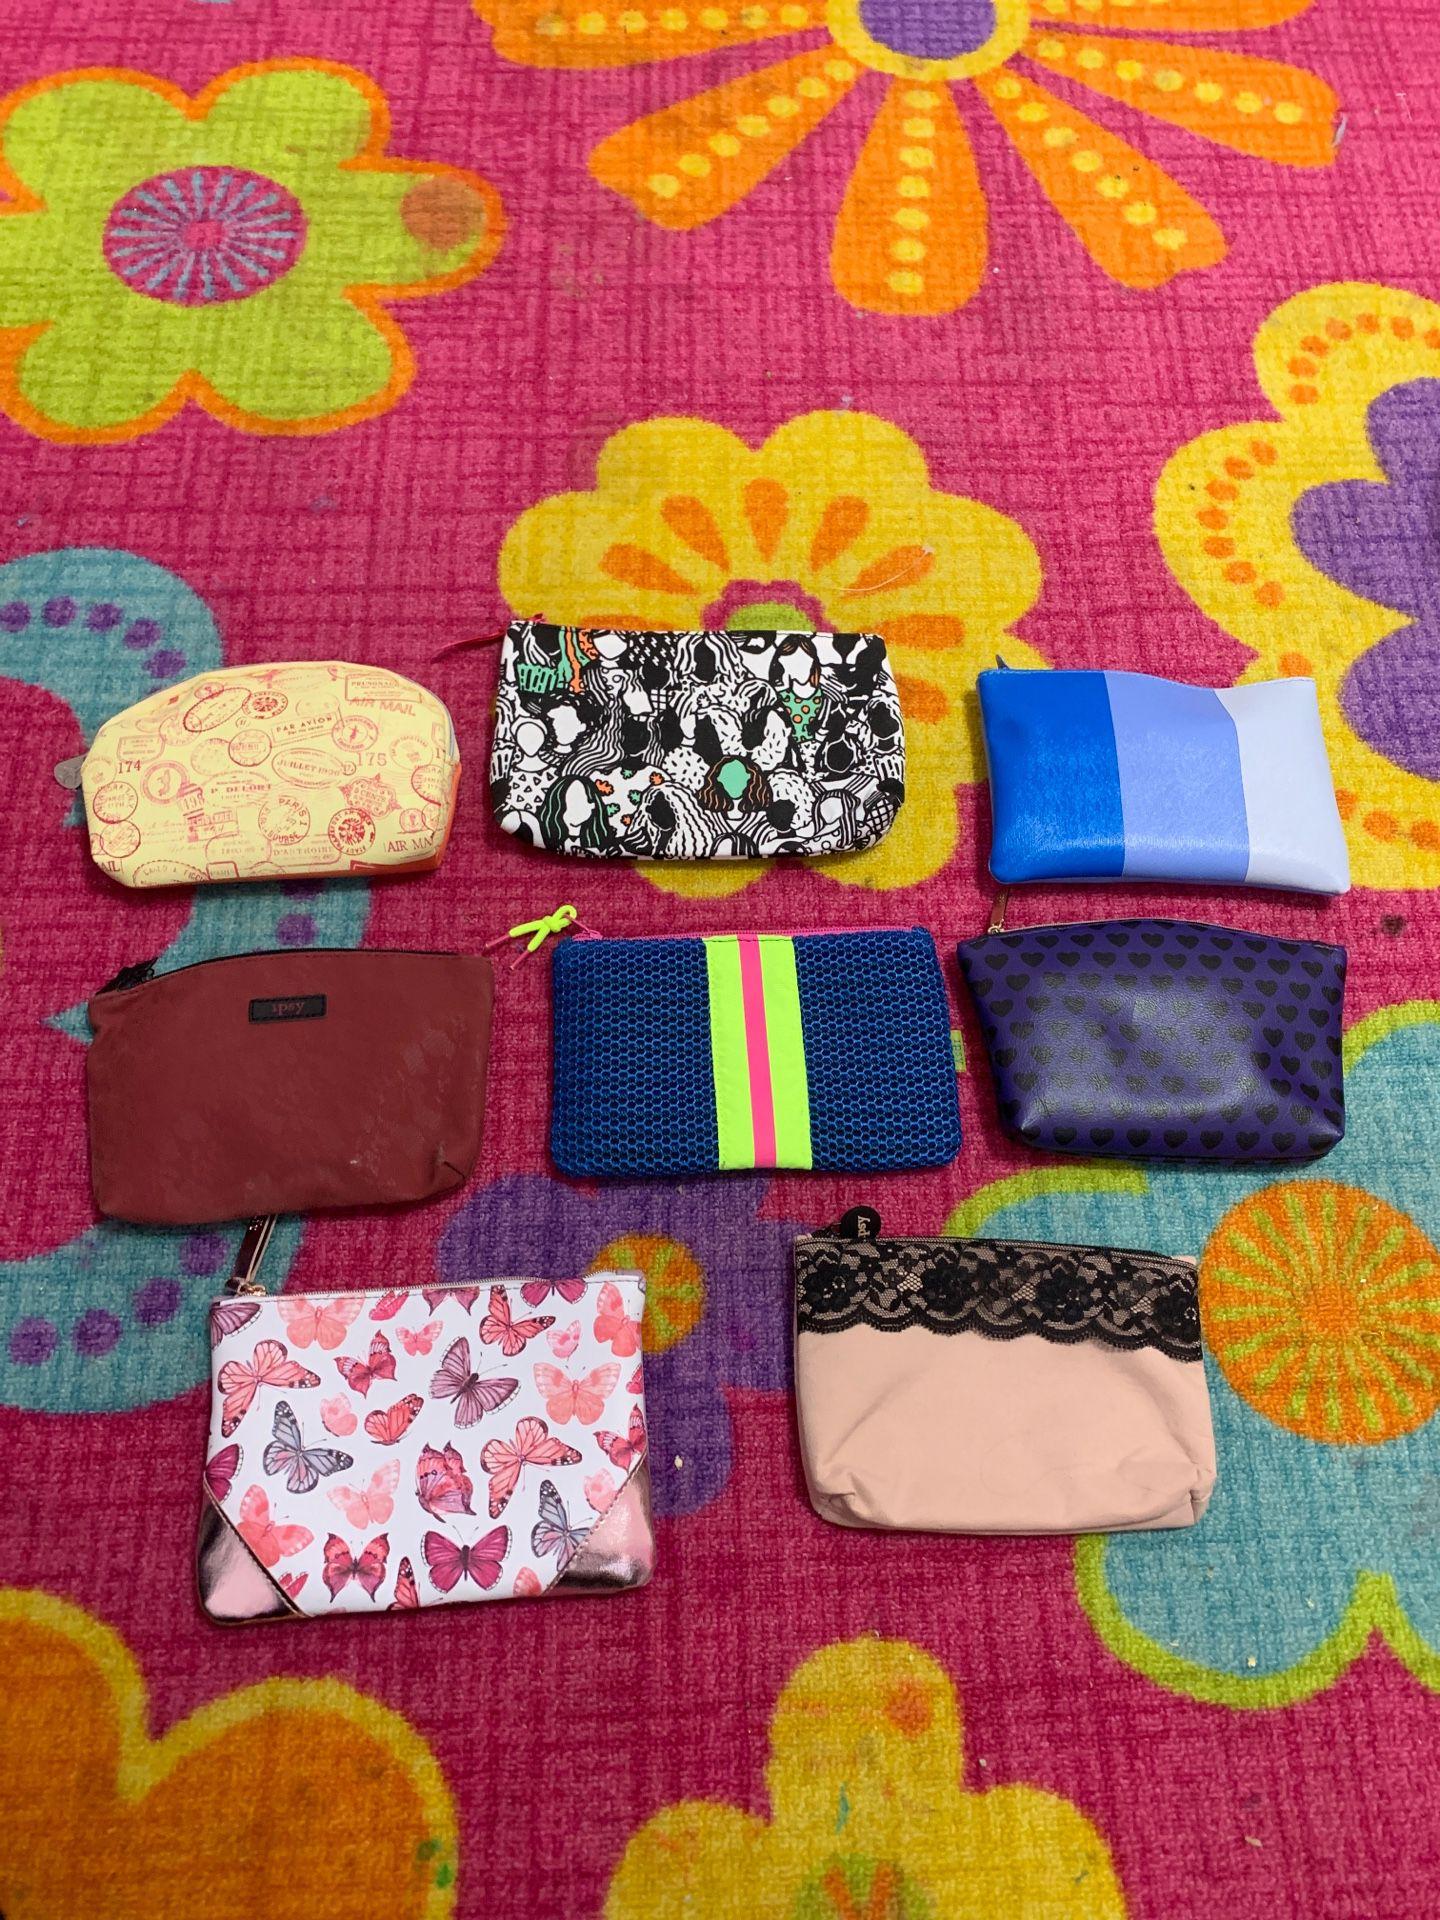 Mini bags/purses